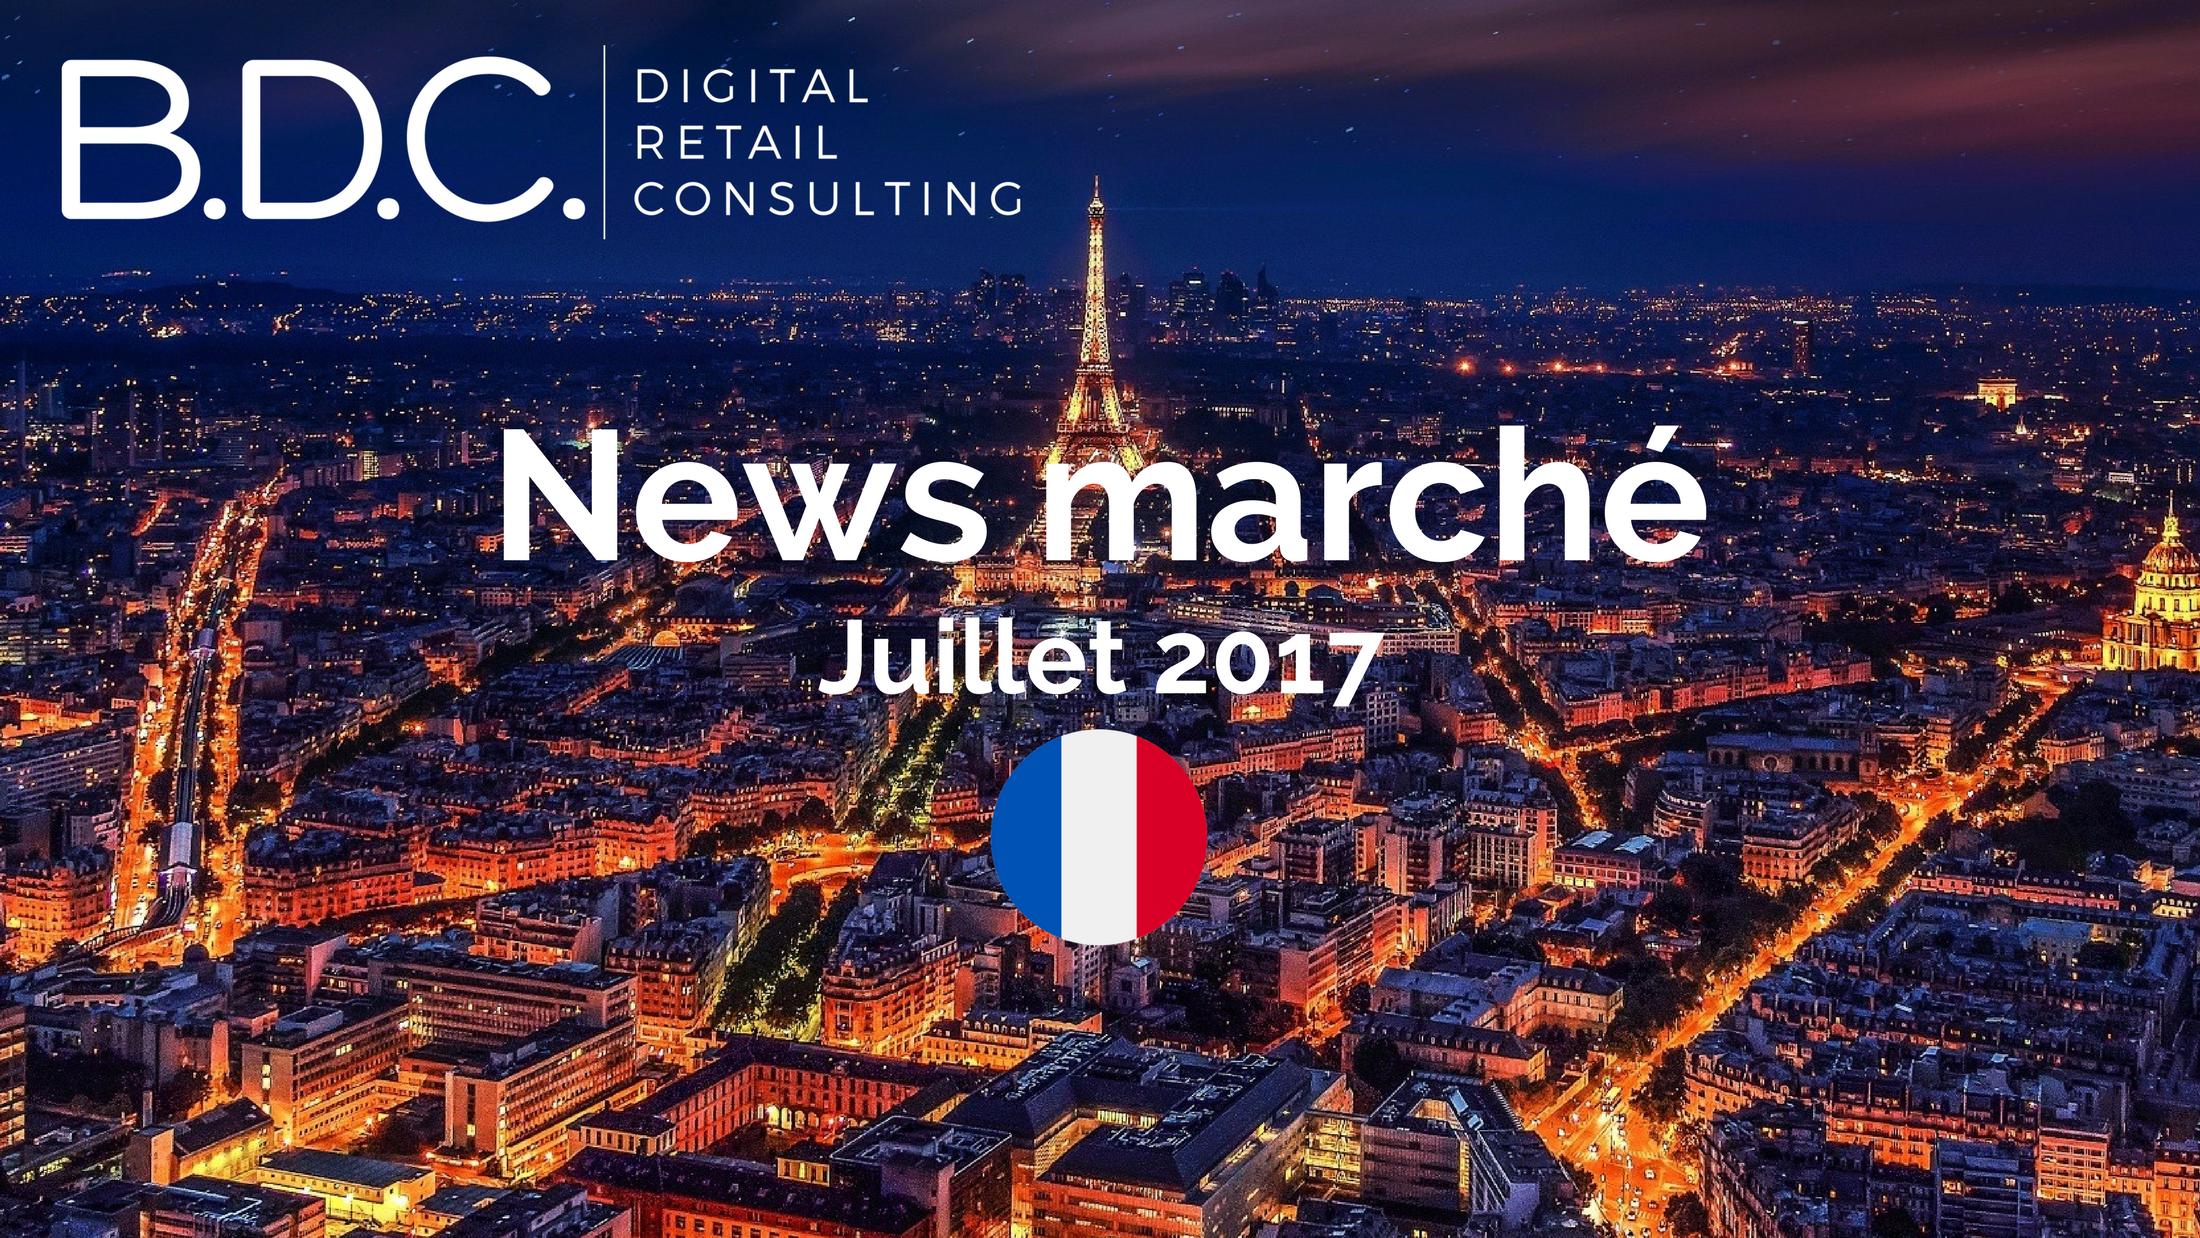 Trends News 13 - News marché - Juillet 2017